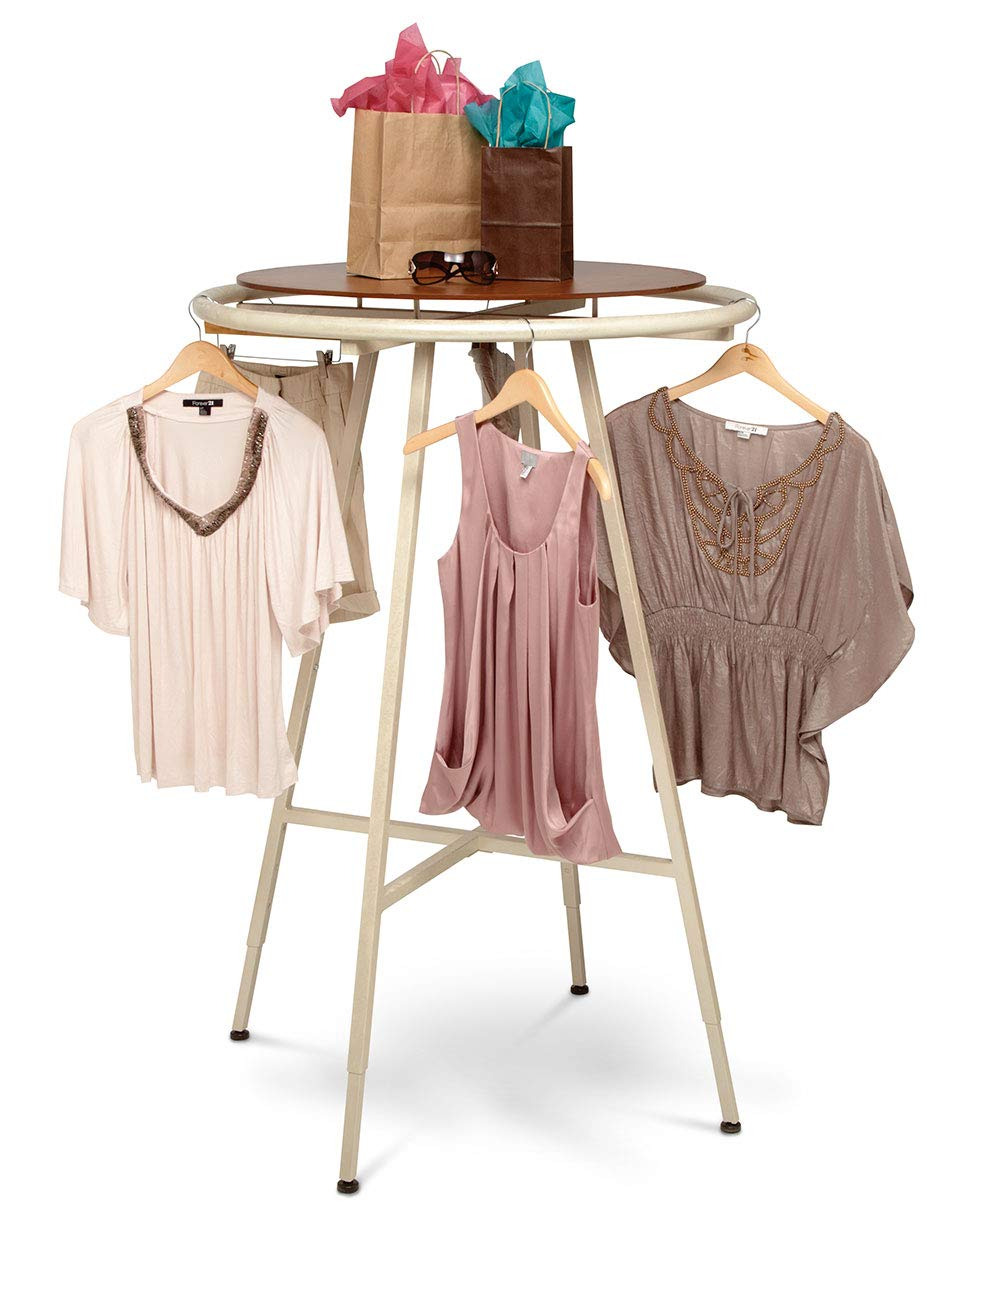 SSWBasics Round Clothing Rack - Ivory (48''-72'' H Adjustable in 3'' increments)